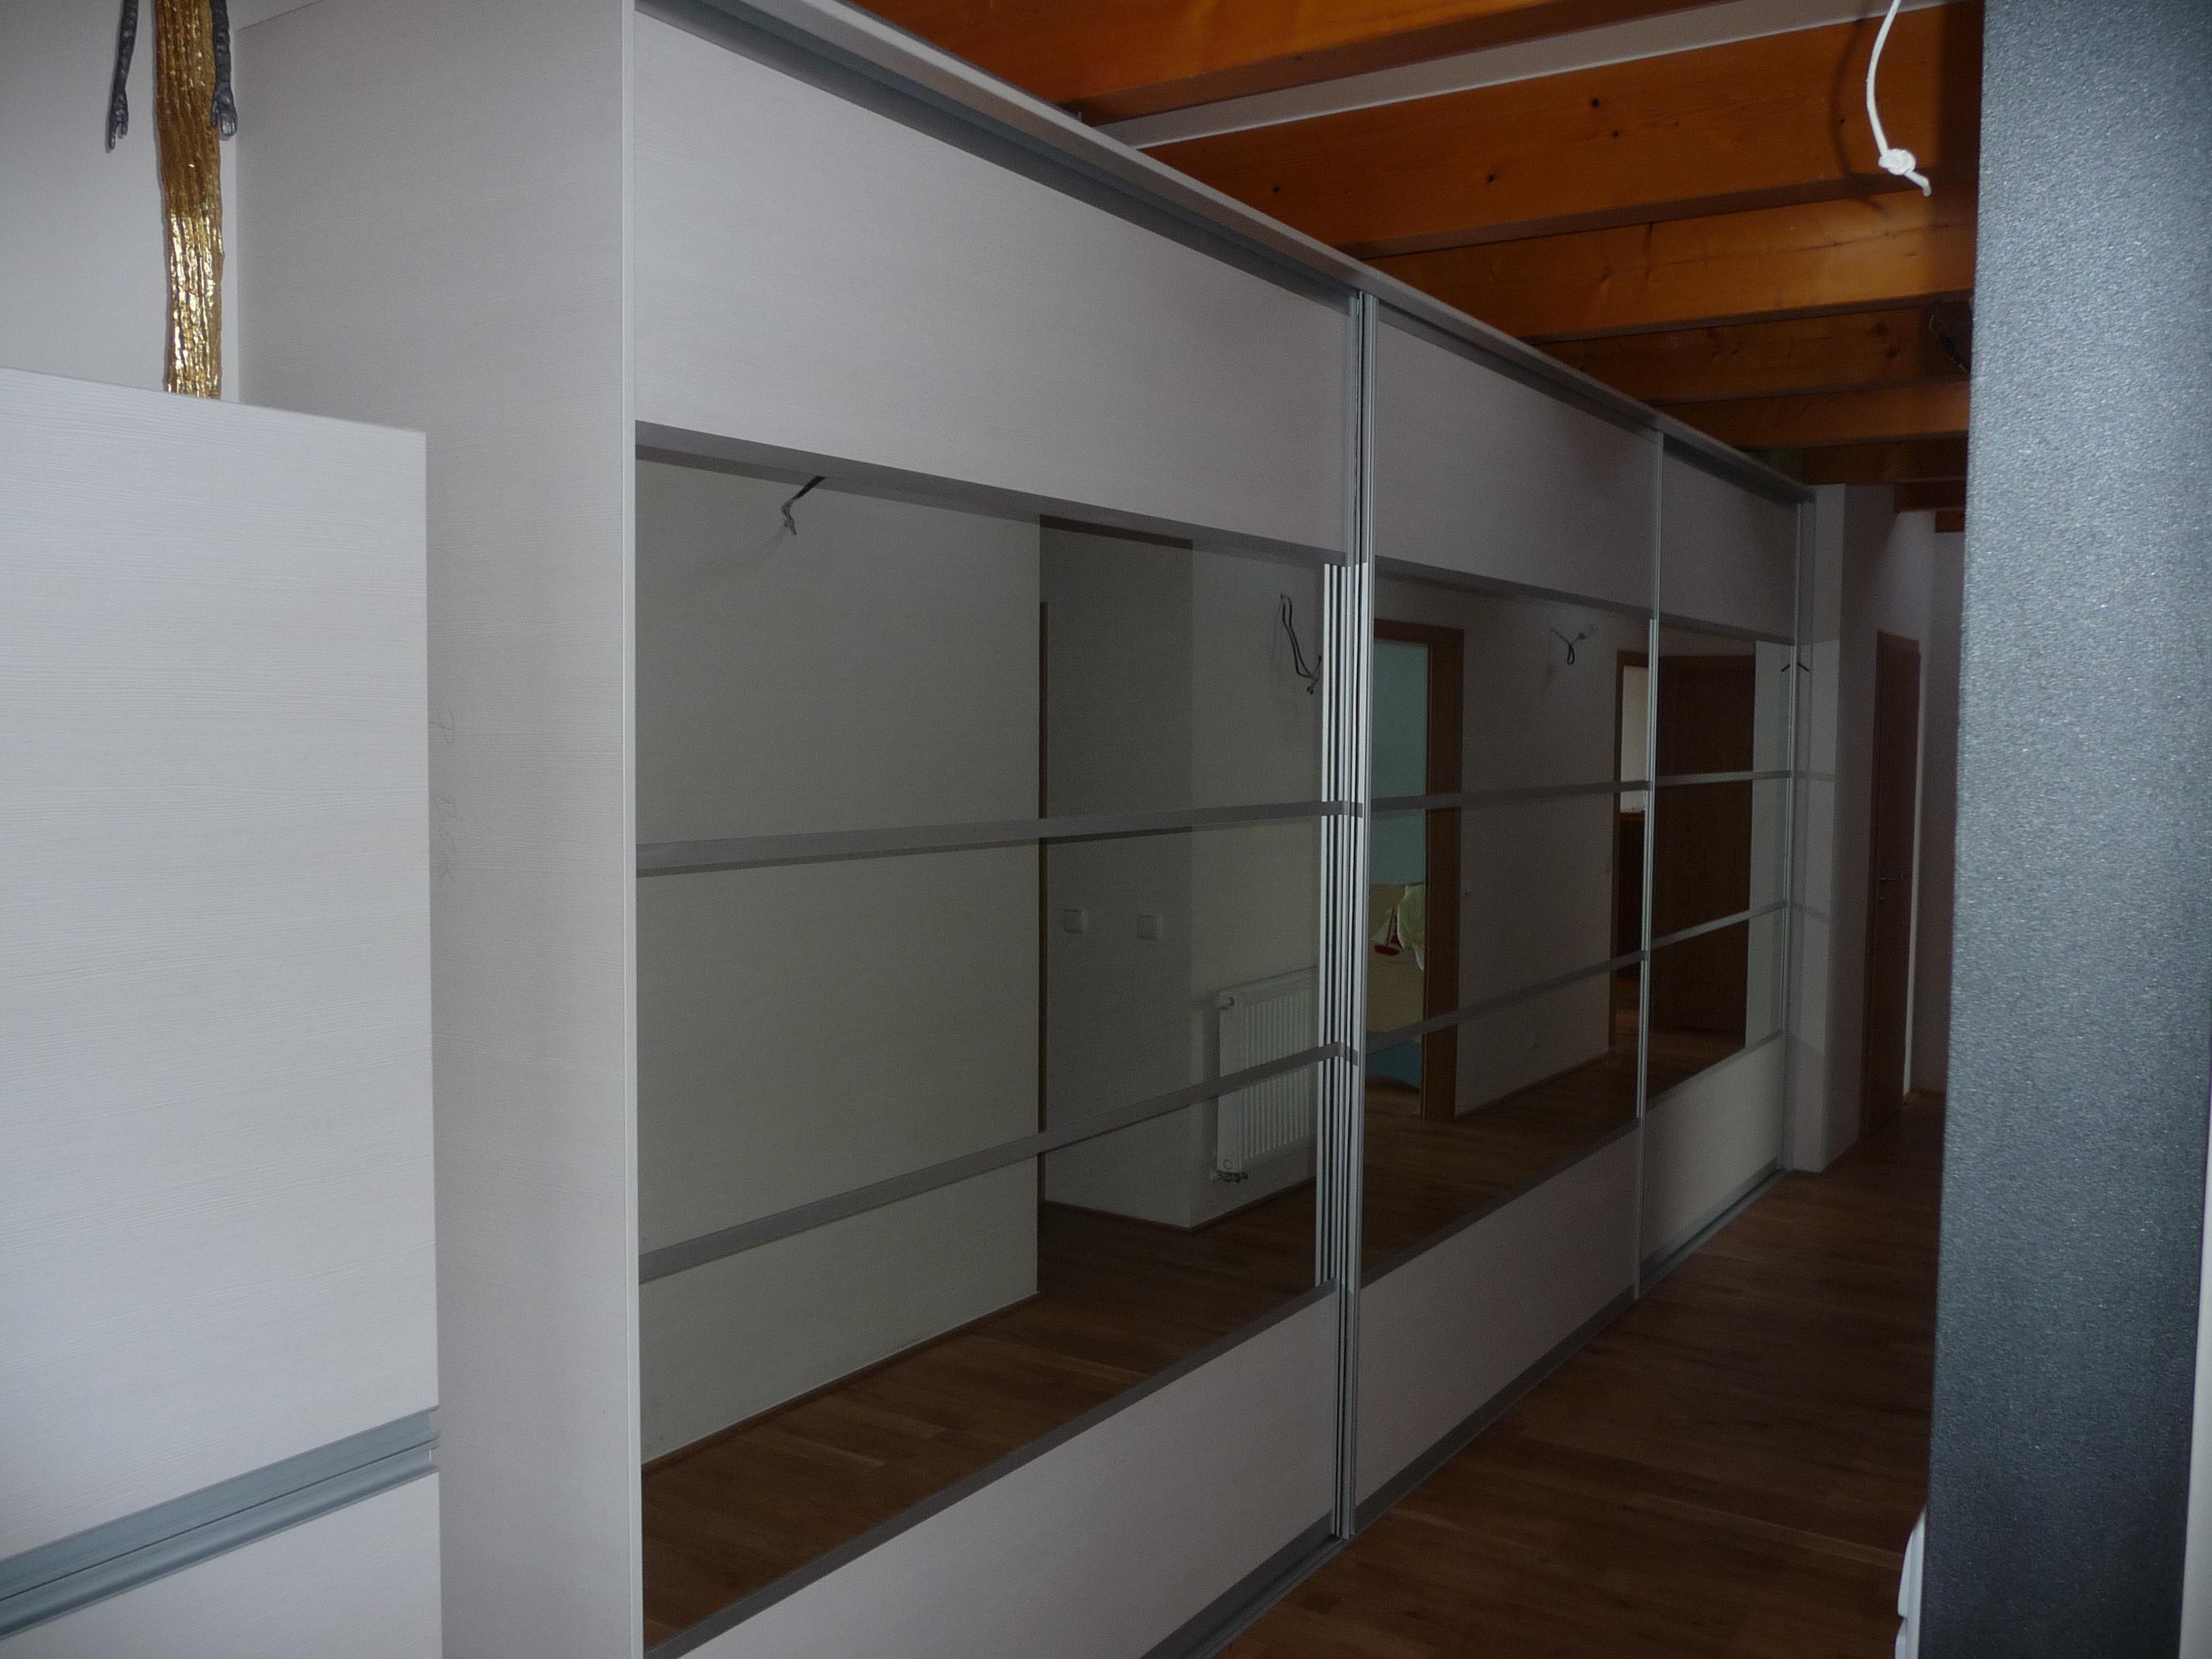 Vestavěná skřín zrcadlo Nymburk